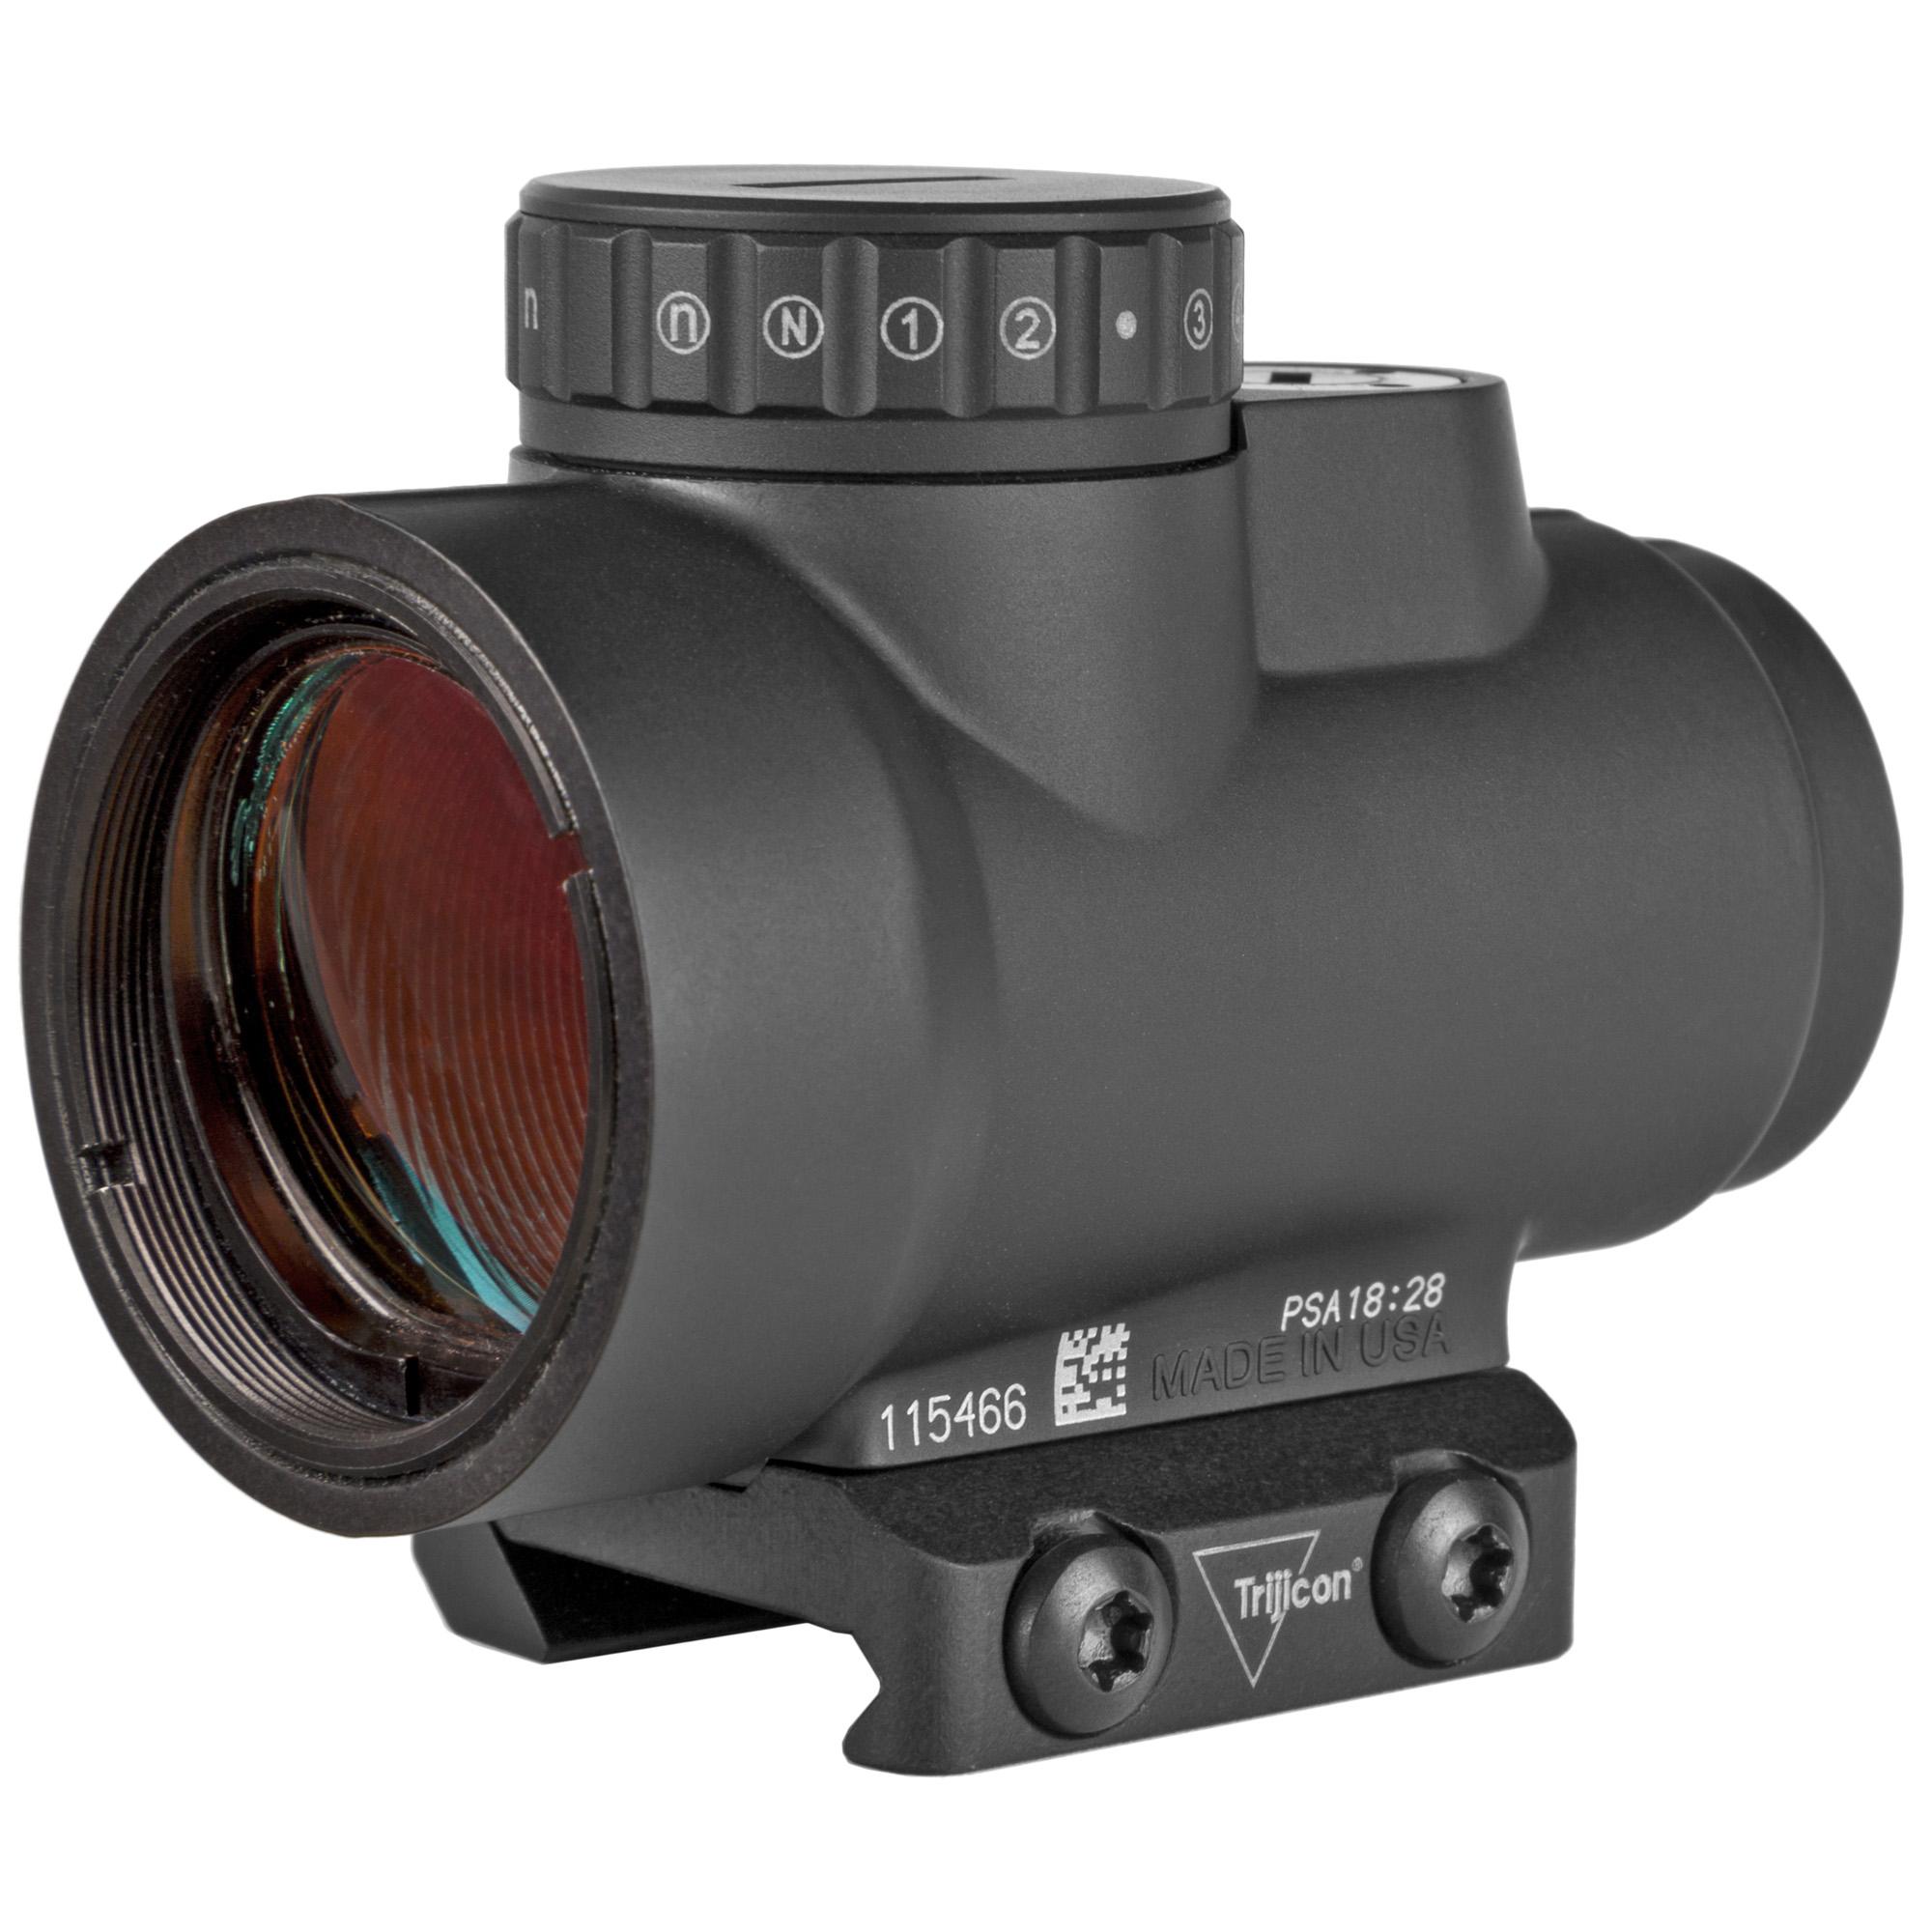 Trijicon MRO HD Red Dot Sight - MSR Arms 4